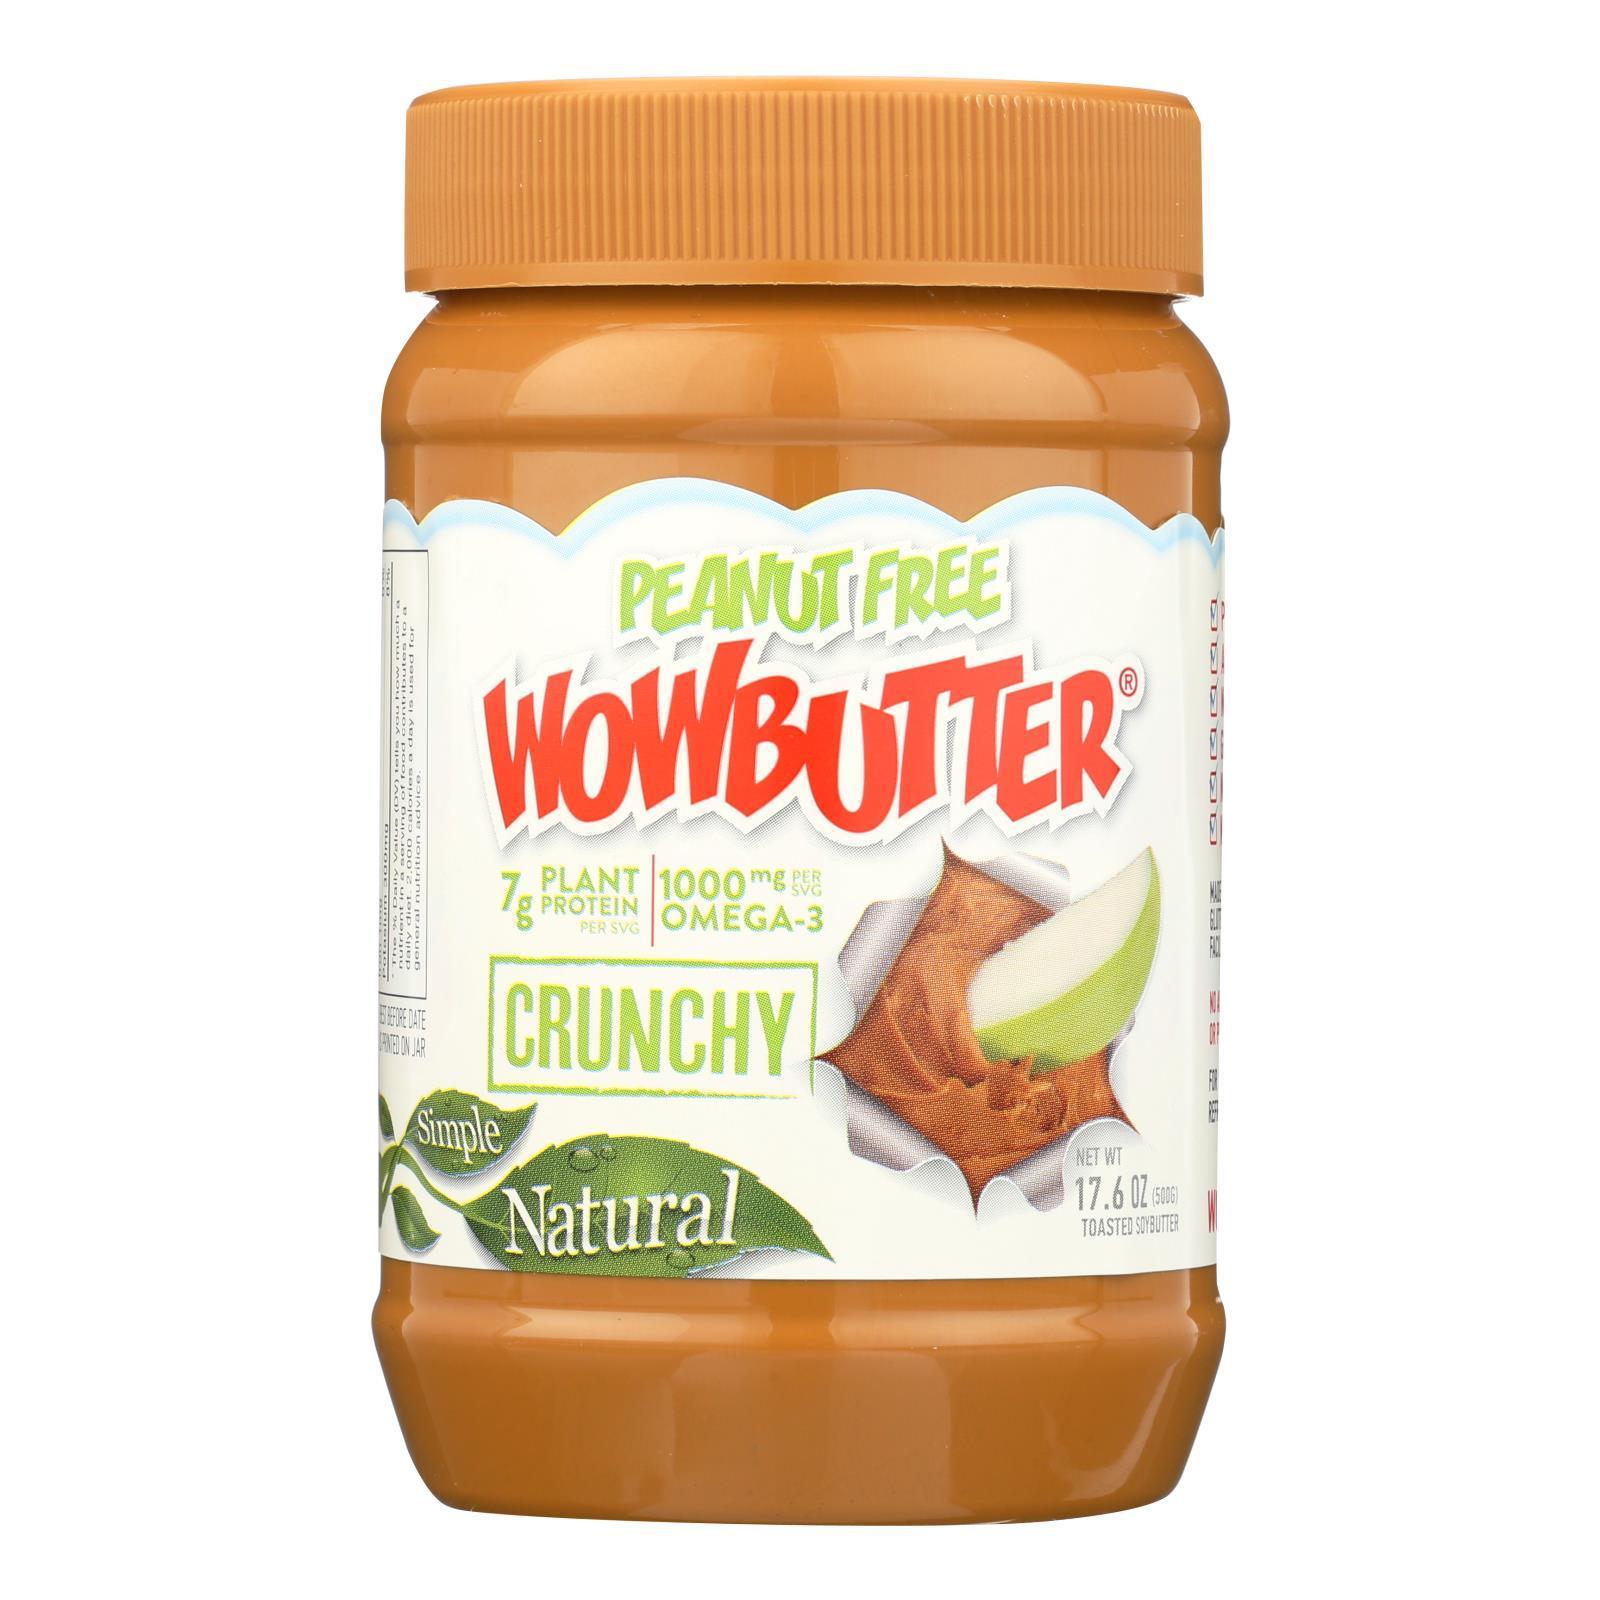 WOWBUTTER Crunchy Peanut Free Spread - Case of 6 - 17.6 oz.